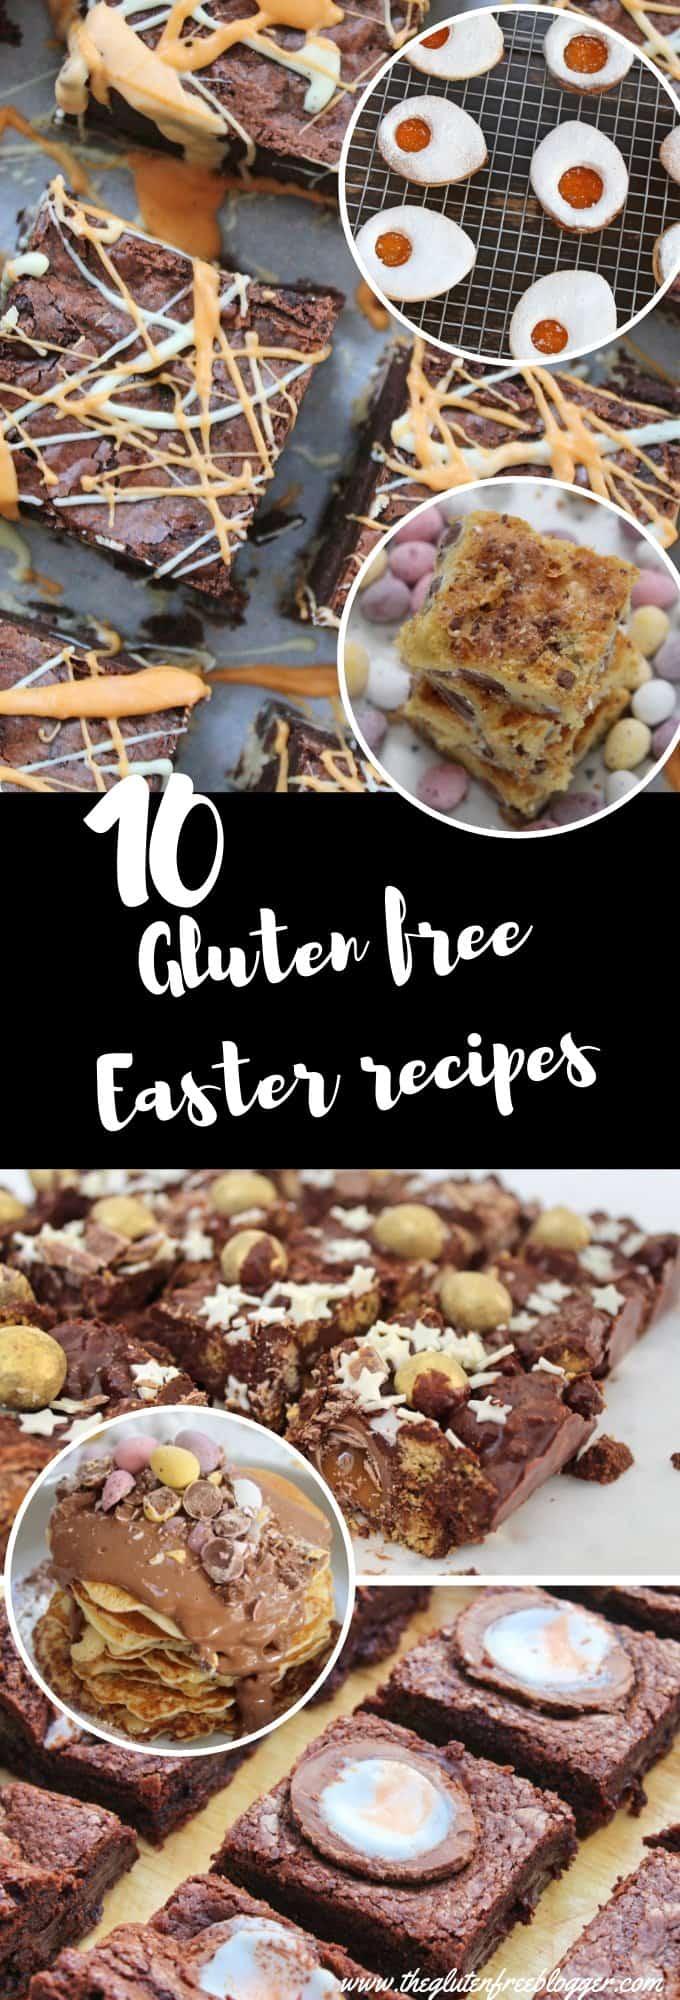 gluten free easter recipes bakes coeliac celiac